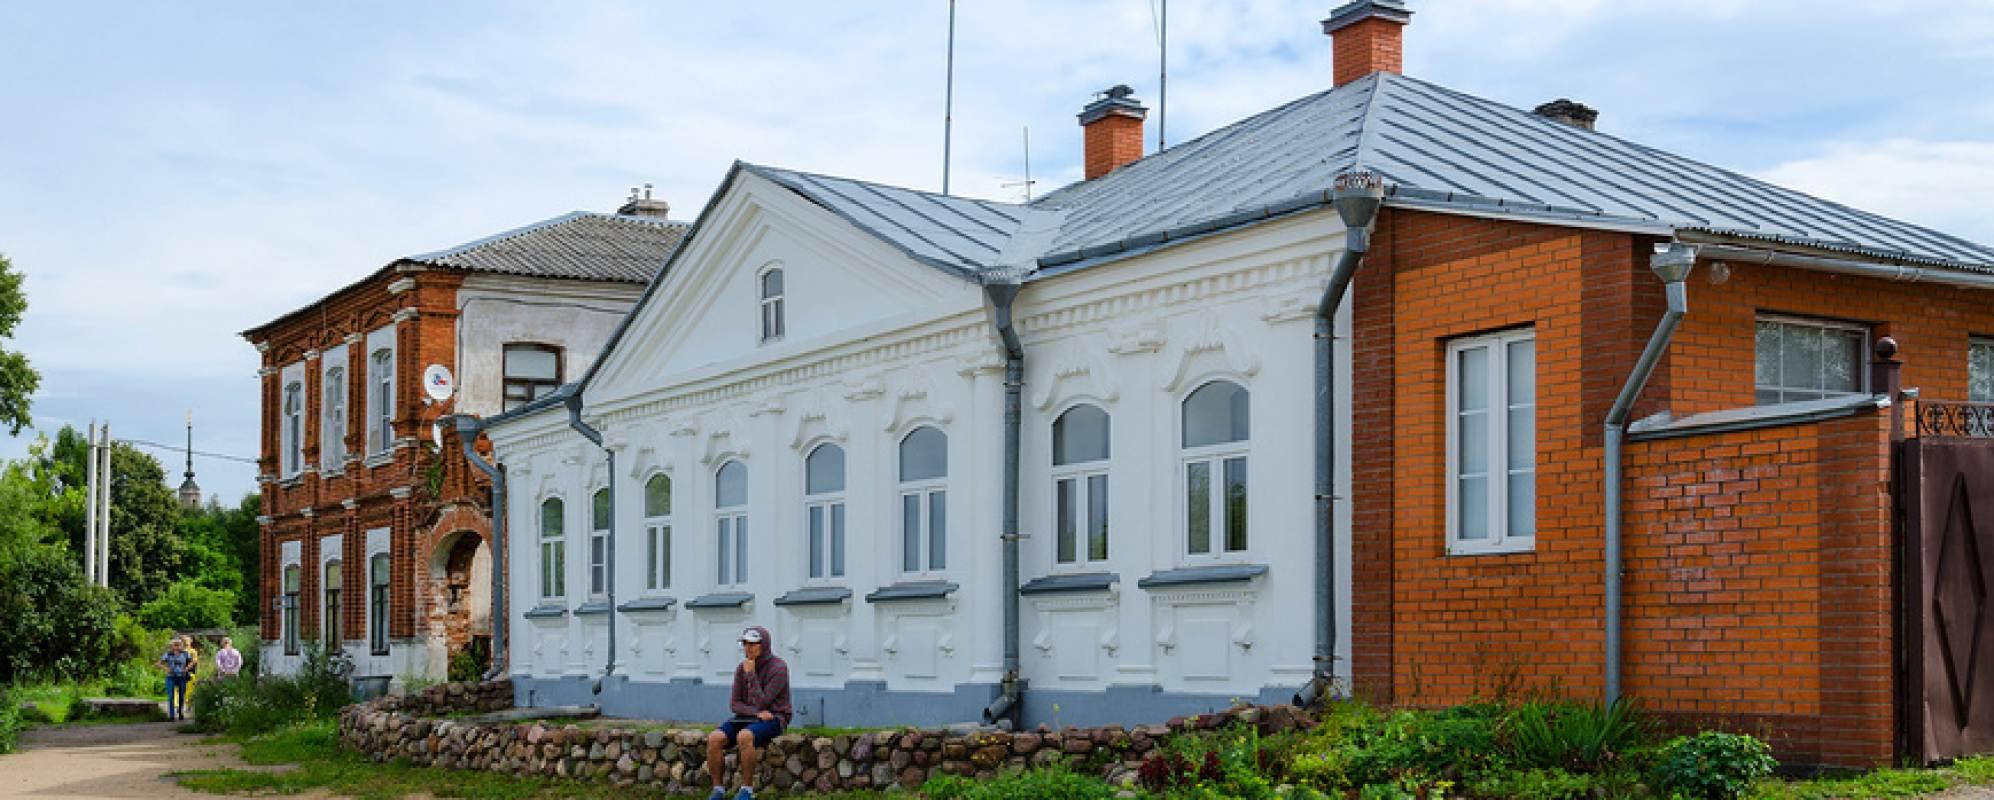 Дом князей Шехонских (Калязин)